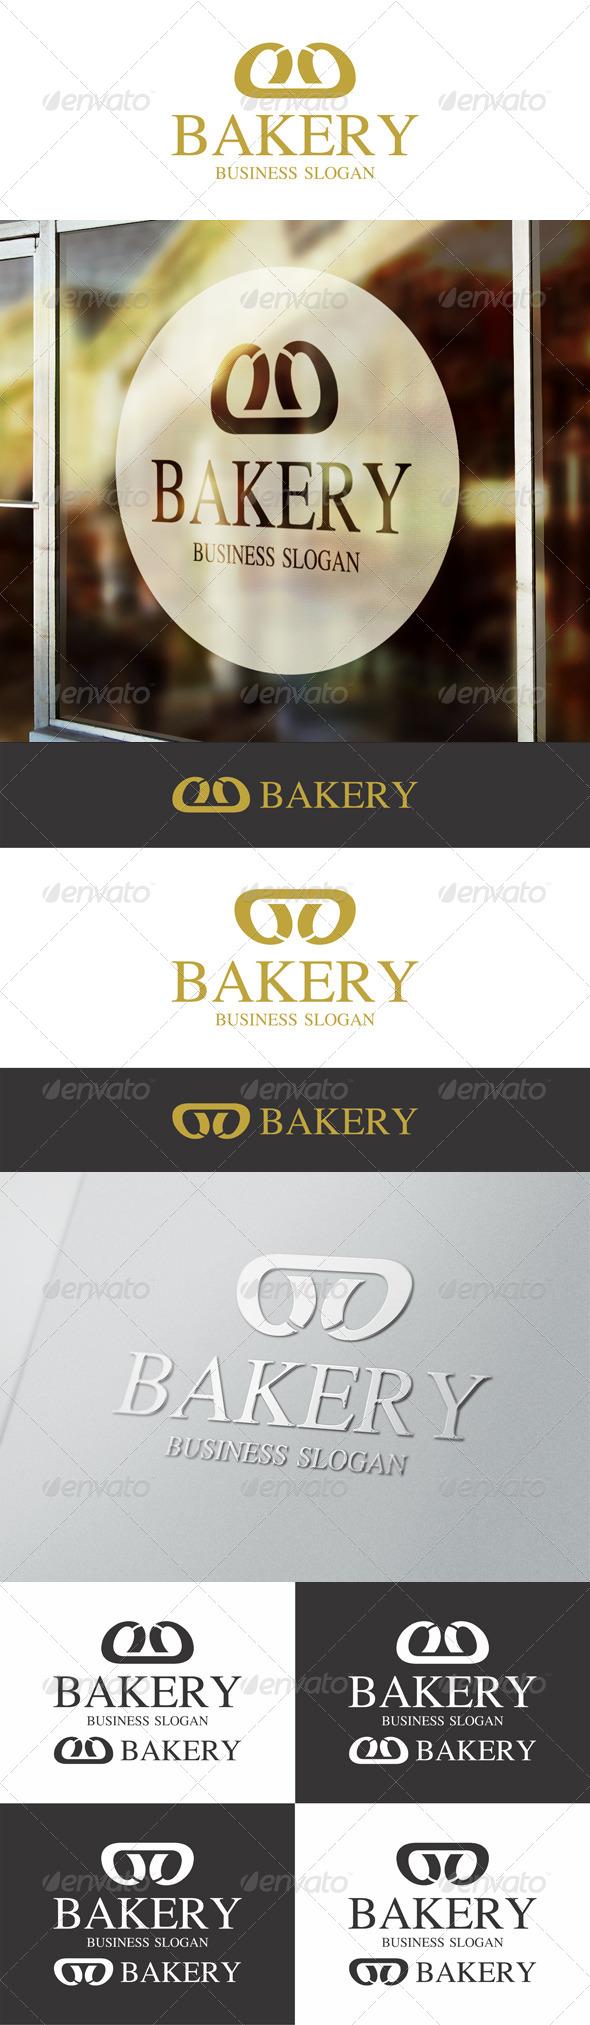 Bakery Bread Logo Template - Symbols Logo Templates